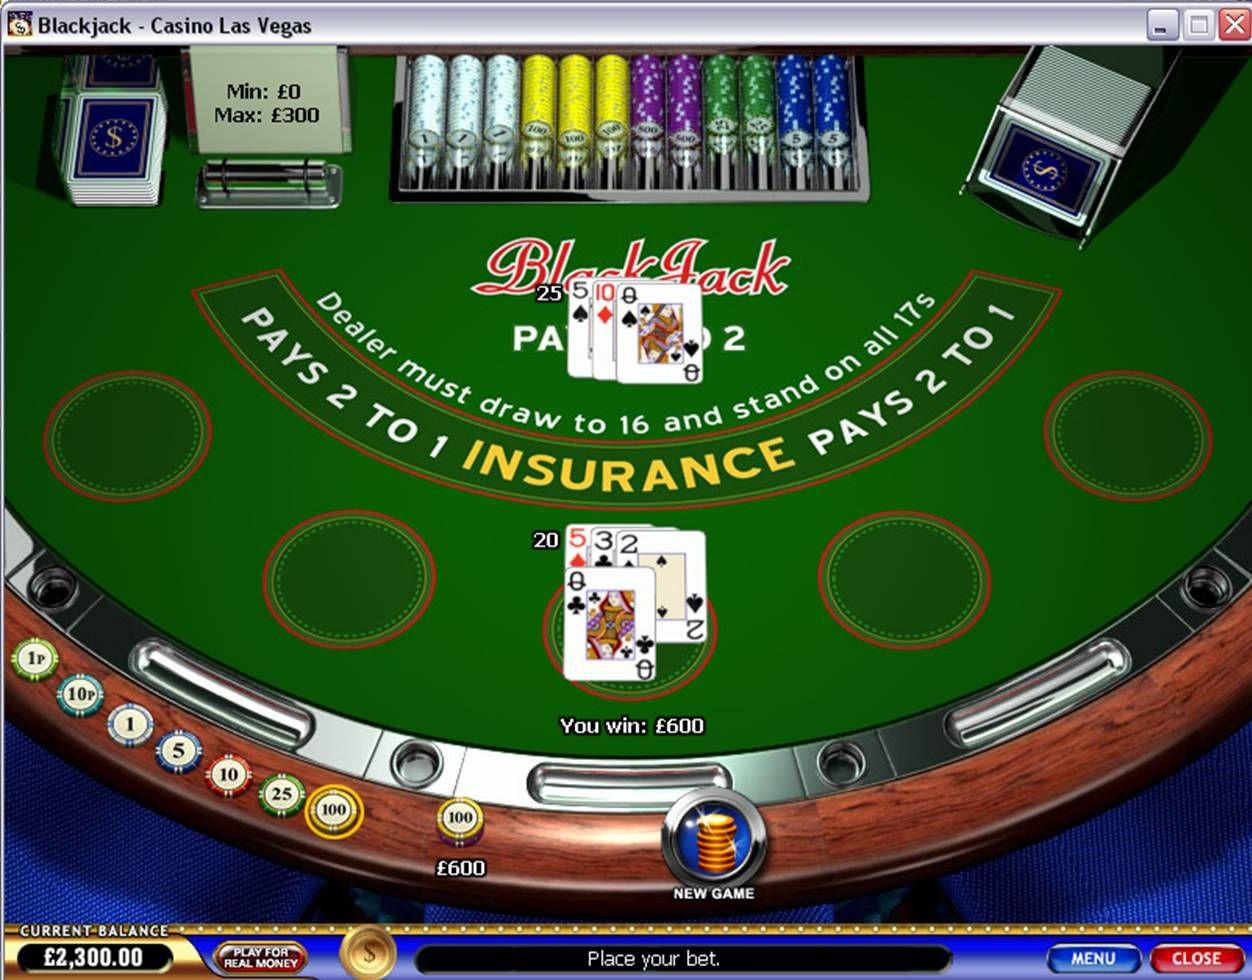 Игровые автоматы gold wing онлайн ласвегас игровые автоматы аренда житомир